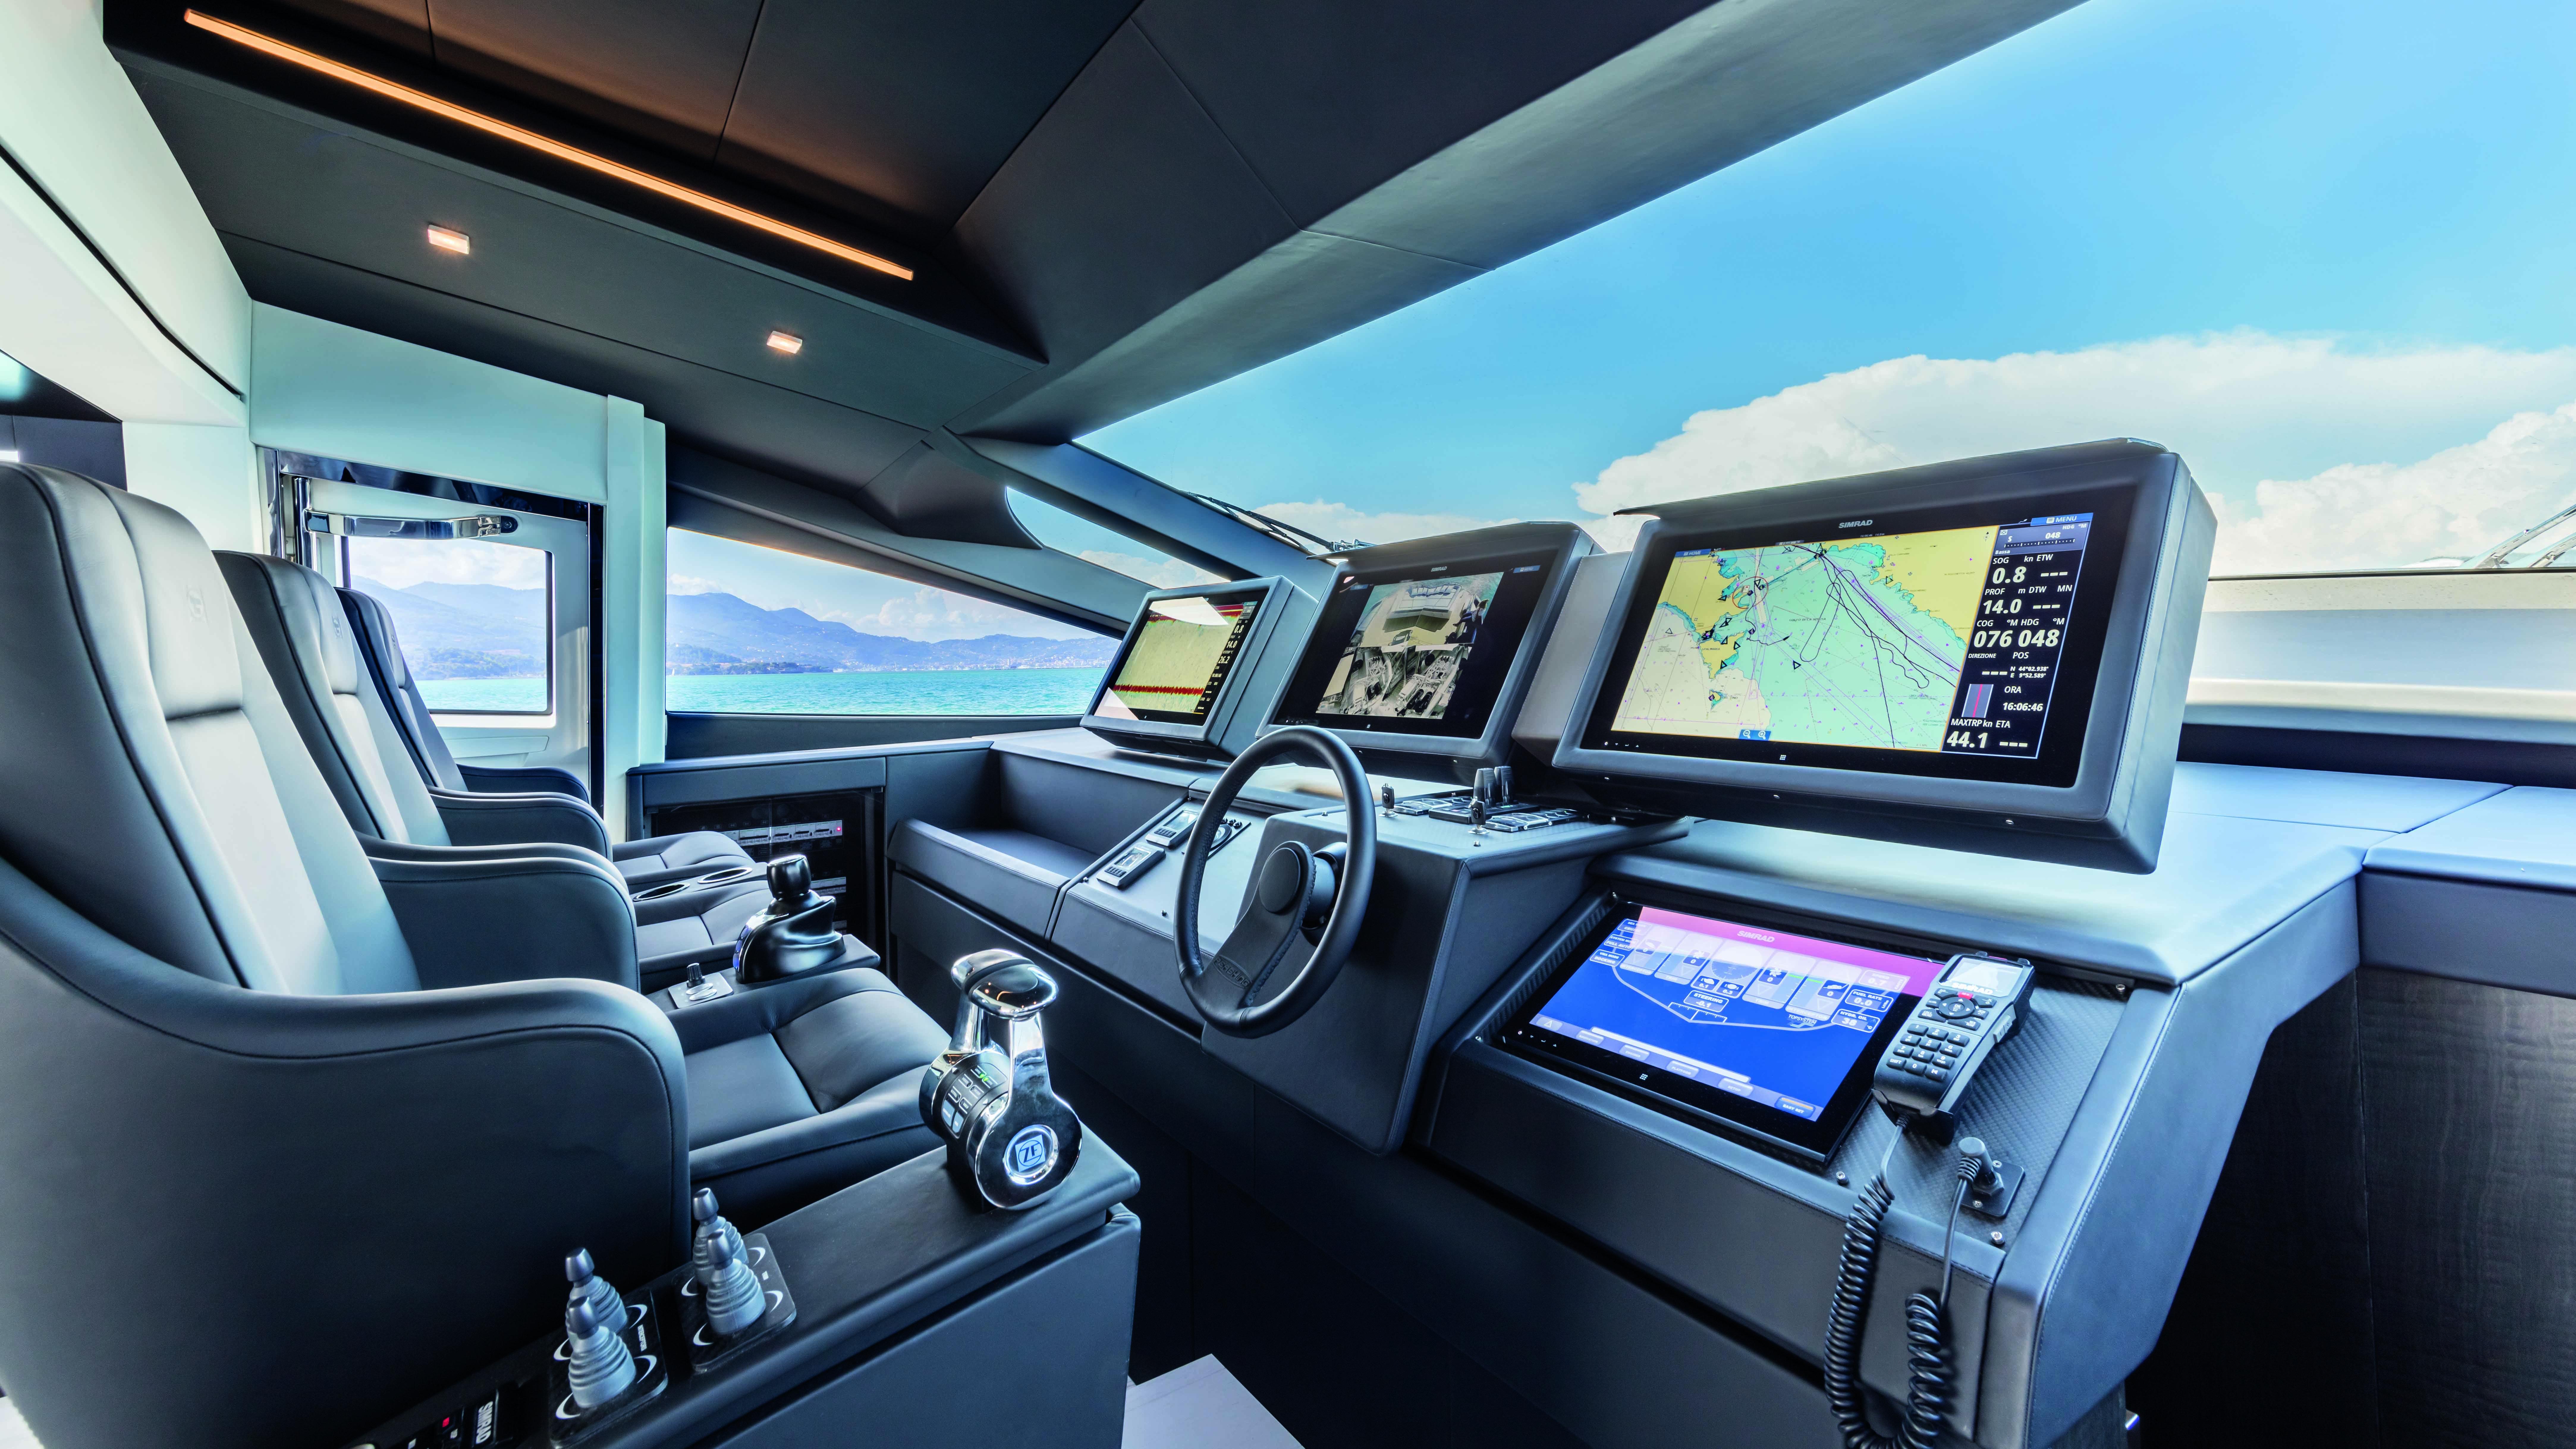 Pershing 9X Yacht poltrona frau italian